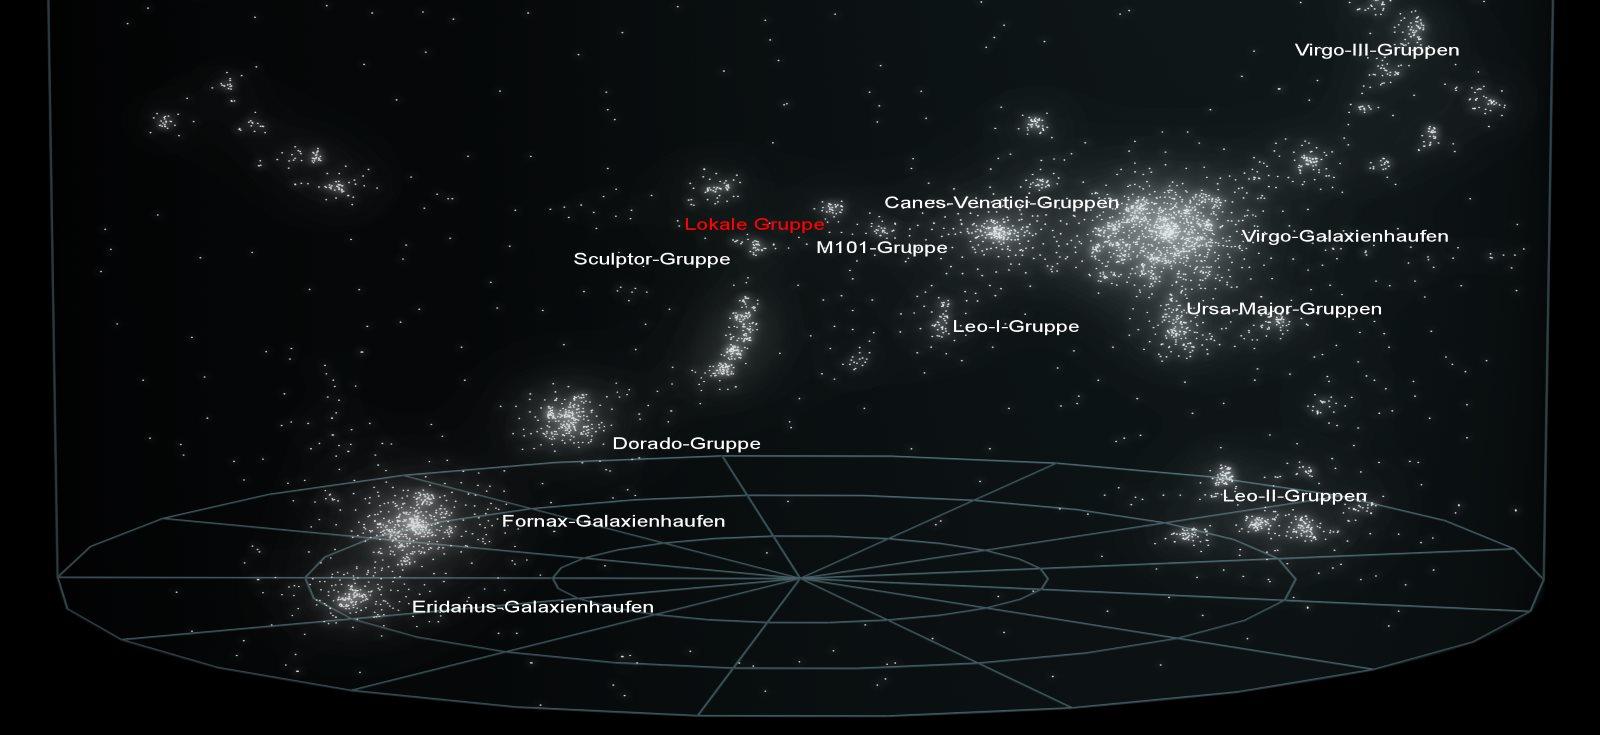 Karte des Virgo-Superhaufens